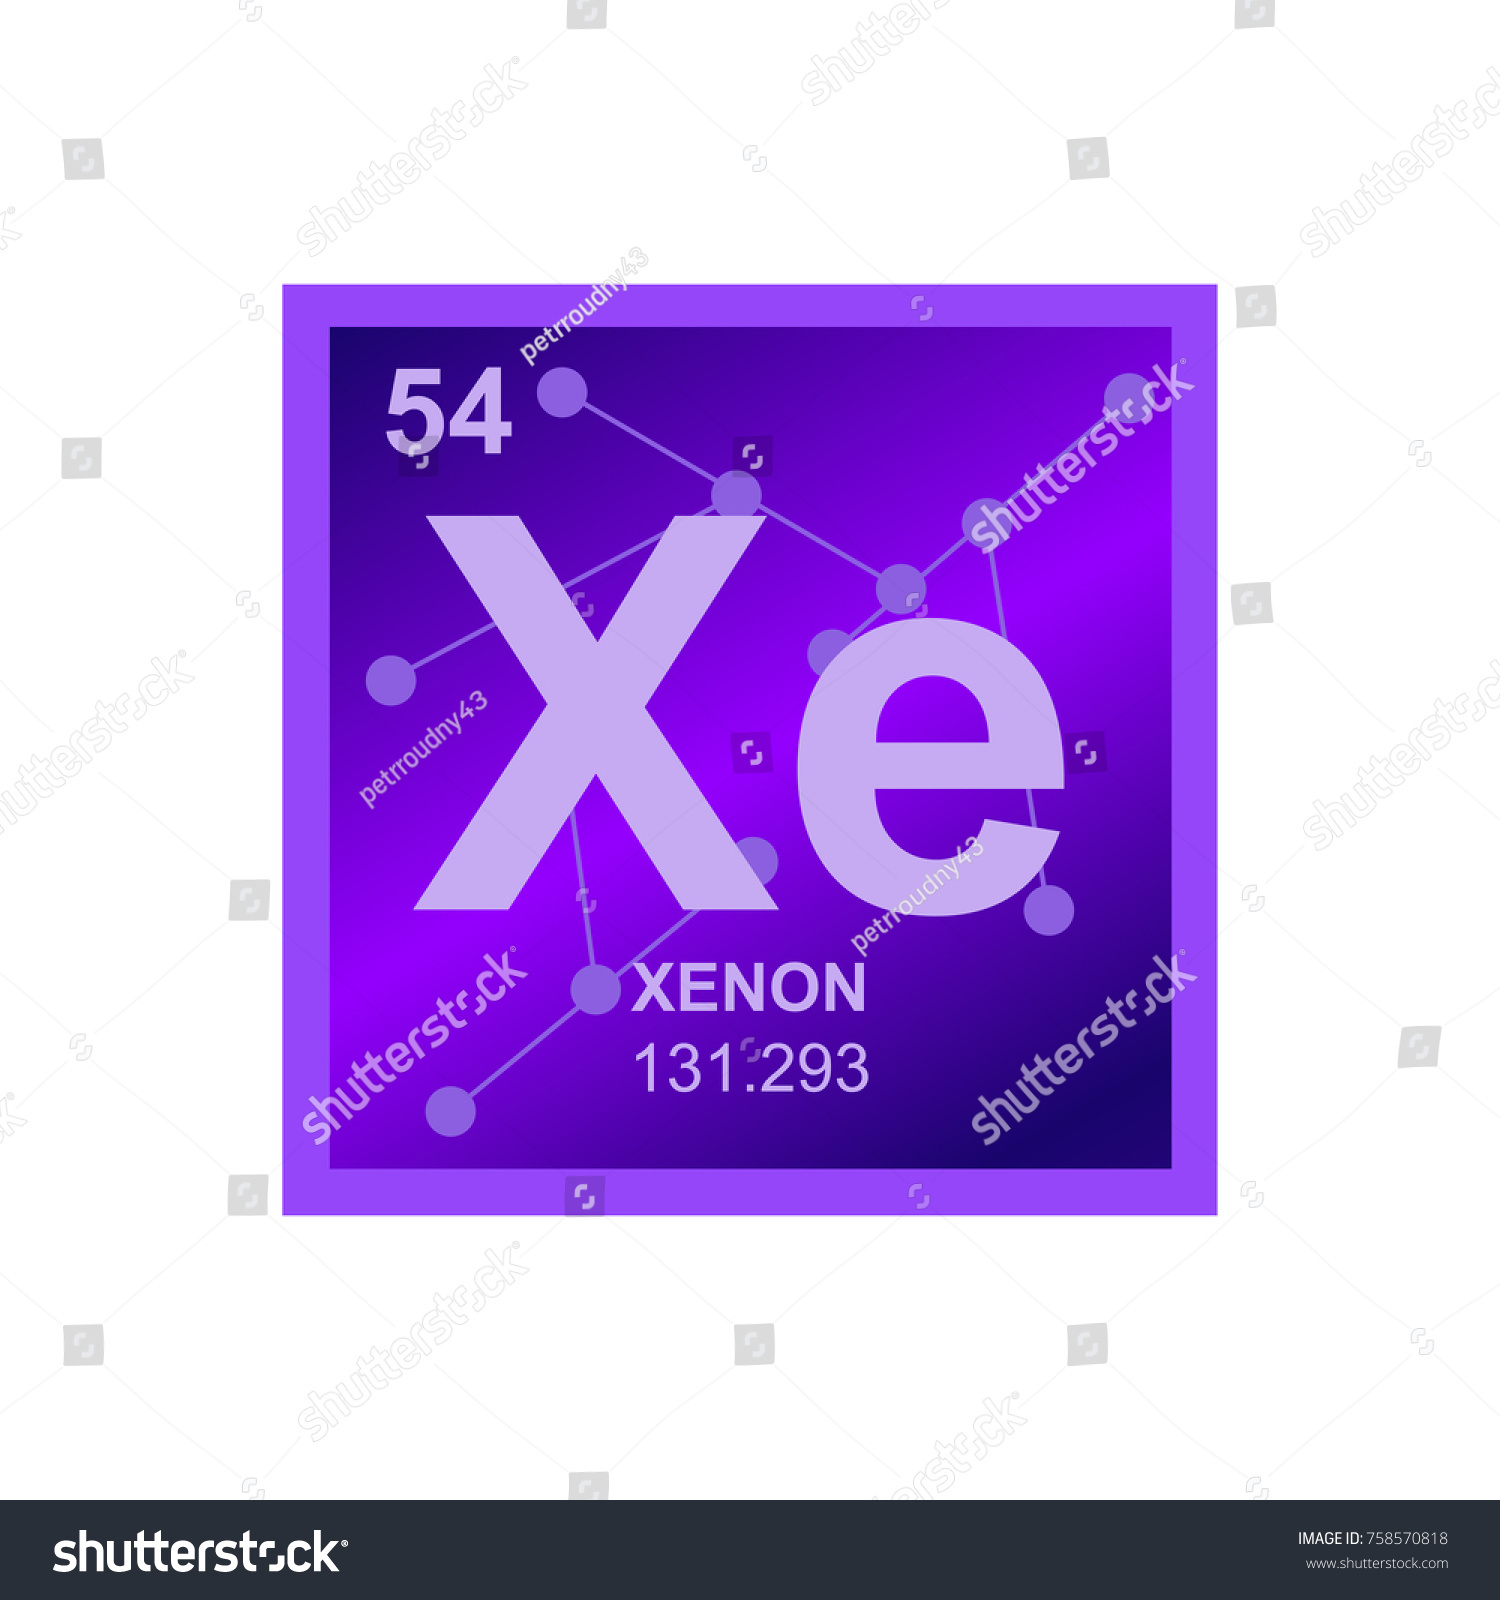 Xenon on the periodic table image collections periodic table images vector symbol rare gas xenon periodic stock vector 758570818 vector symbol of a rare gas xenon gamestrikefo Gallery